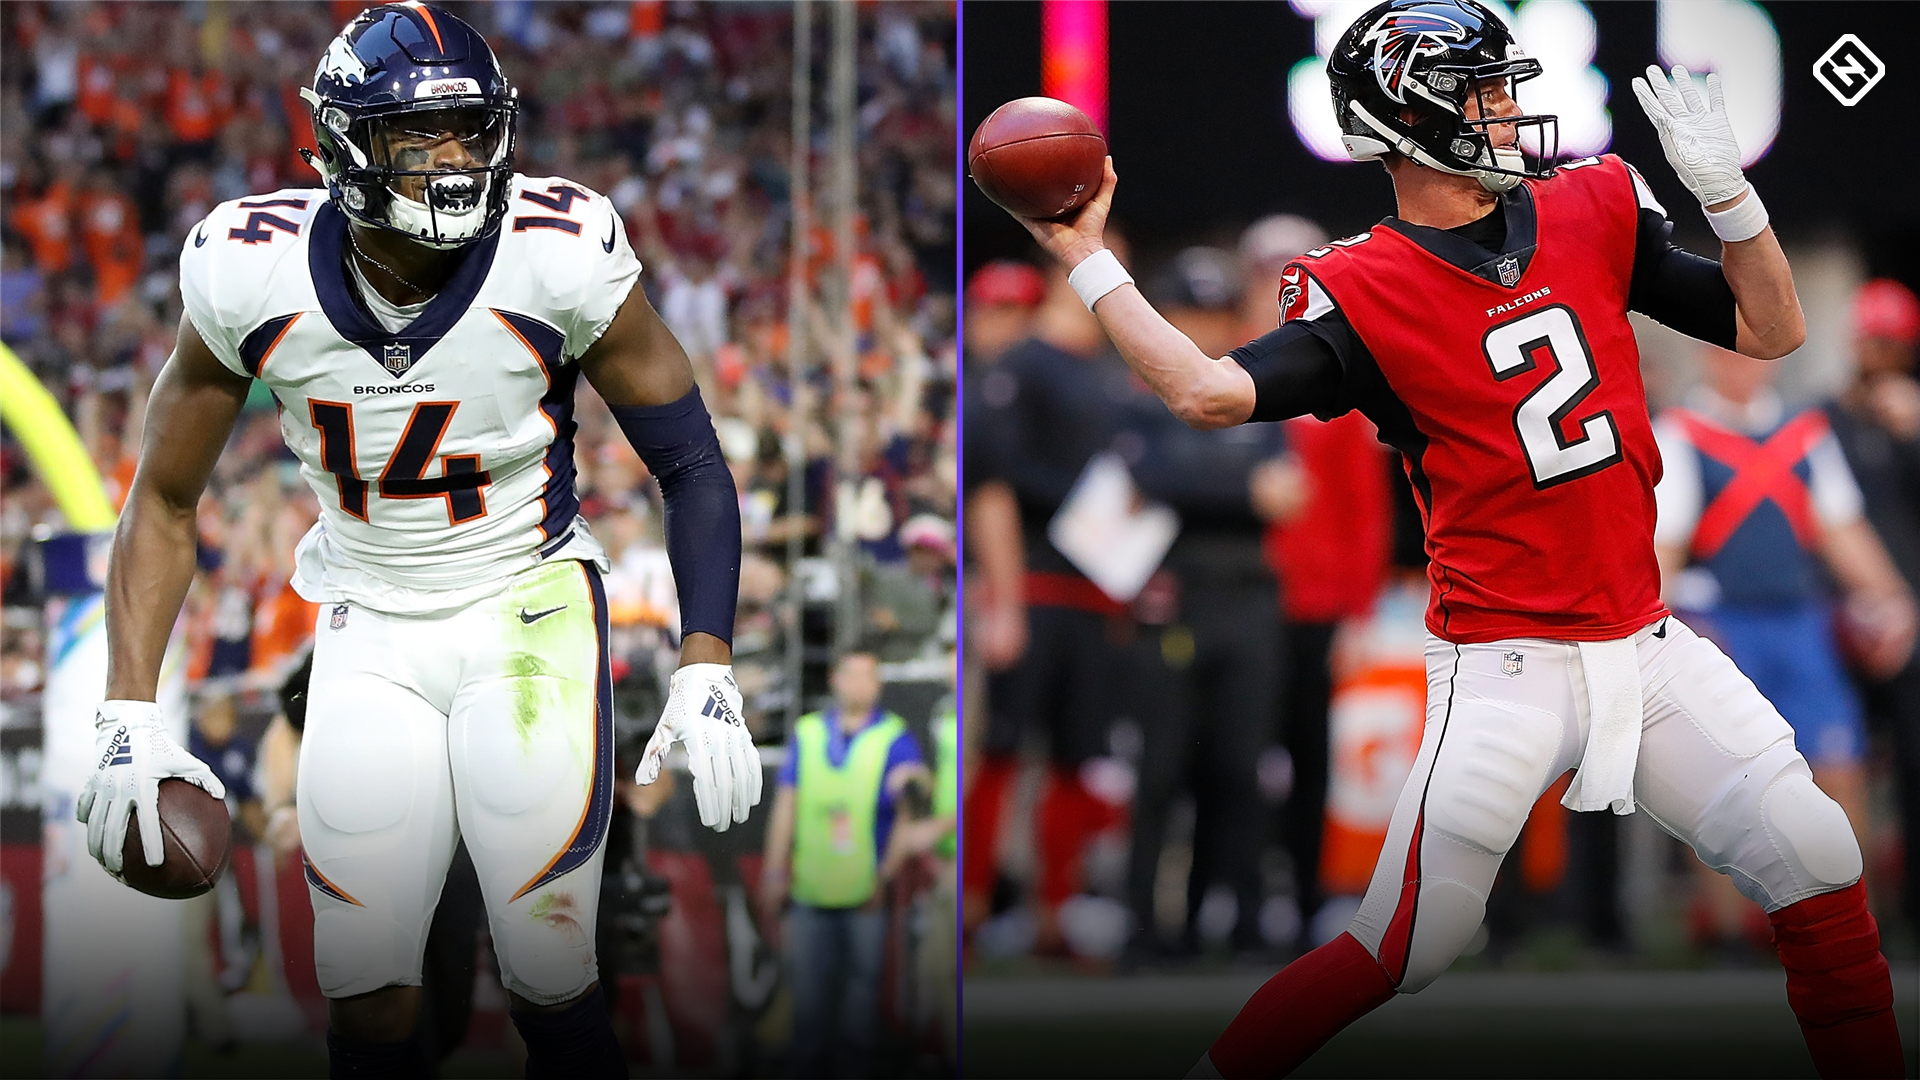 Projected Week 14 DraftKings ownership percentage, NFL DFS